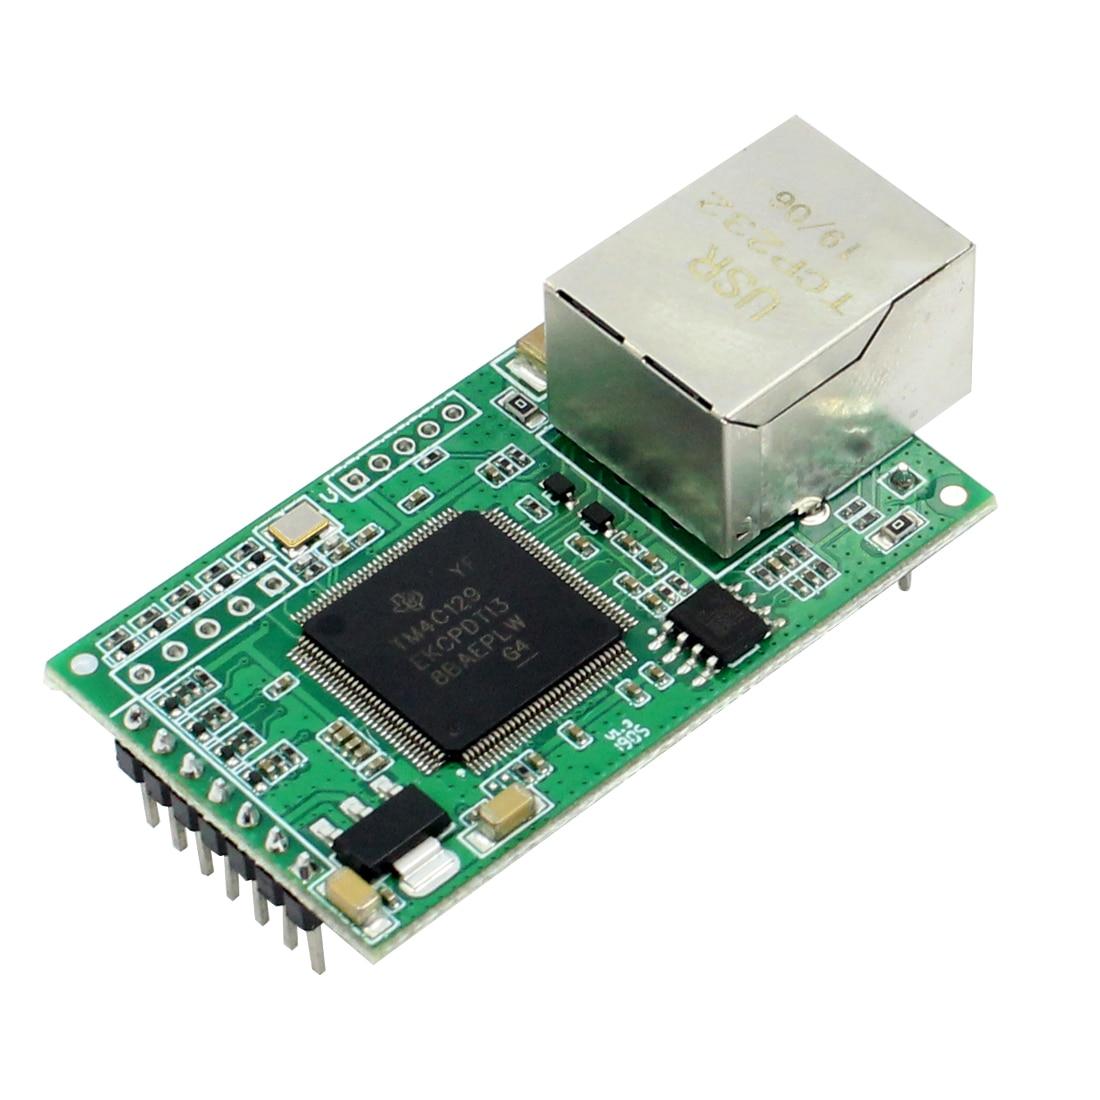 1 piece USR-TCP232-E2 Pin Type Serial UART TTL to LAN Ethernet Module 2 serial ports 1